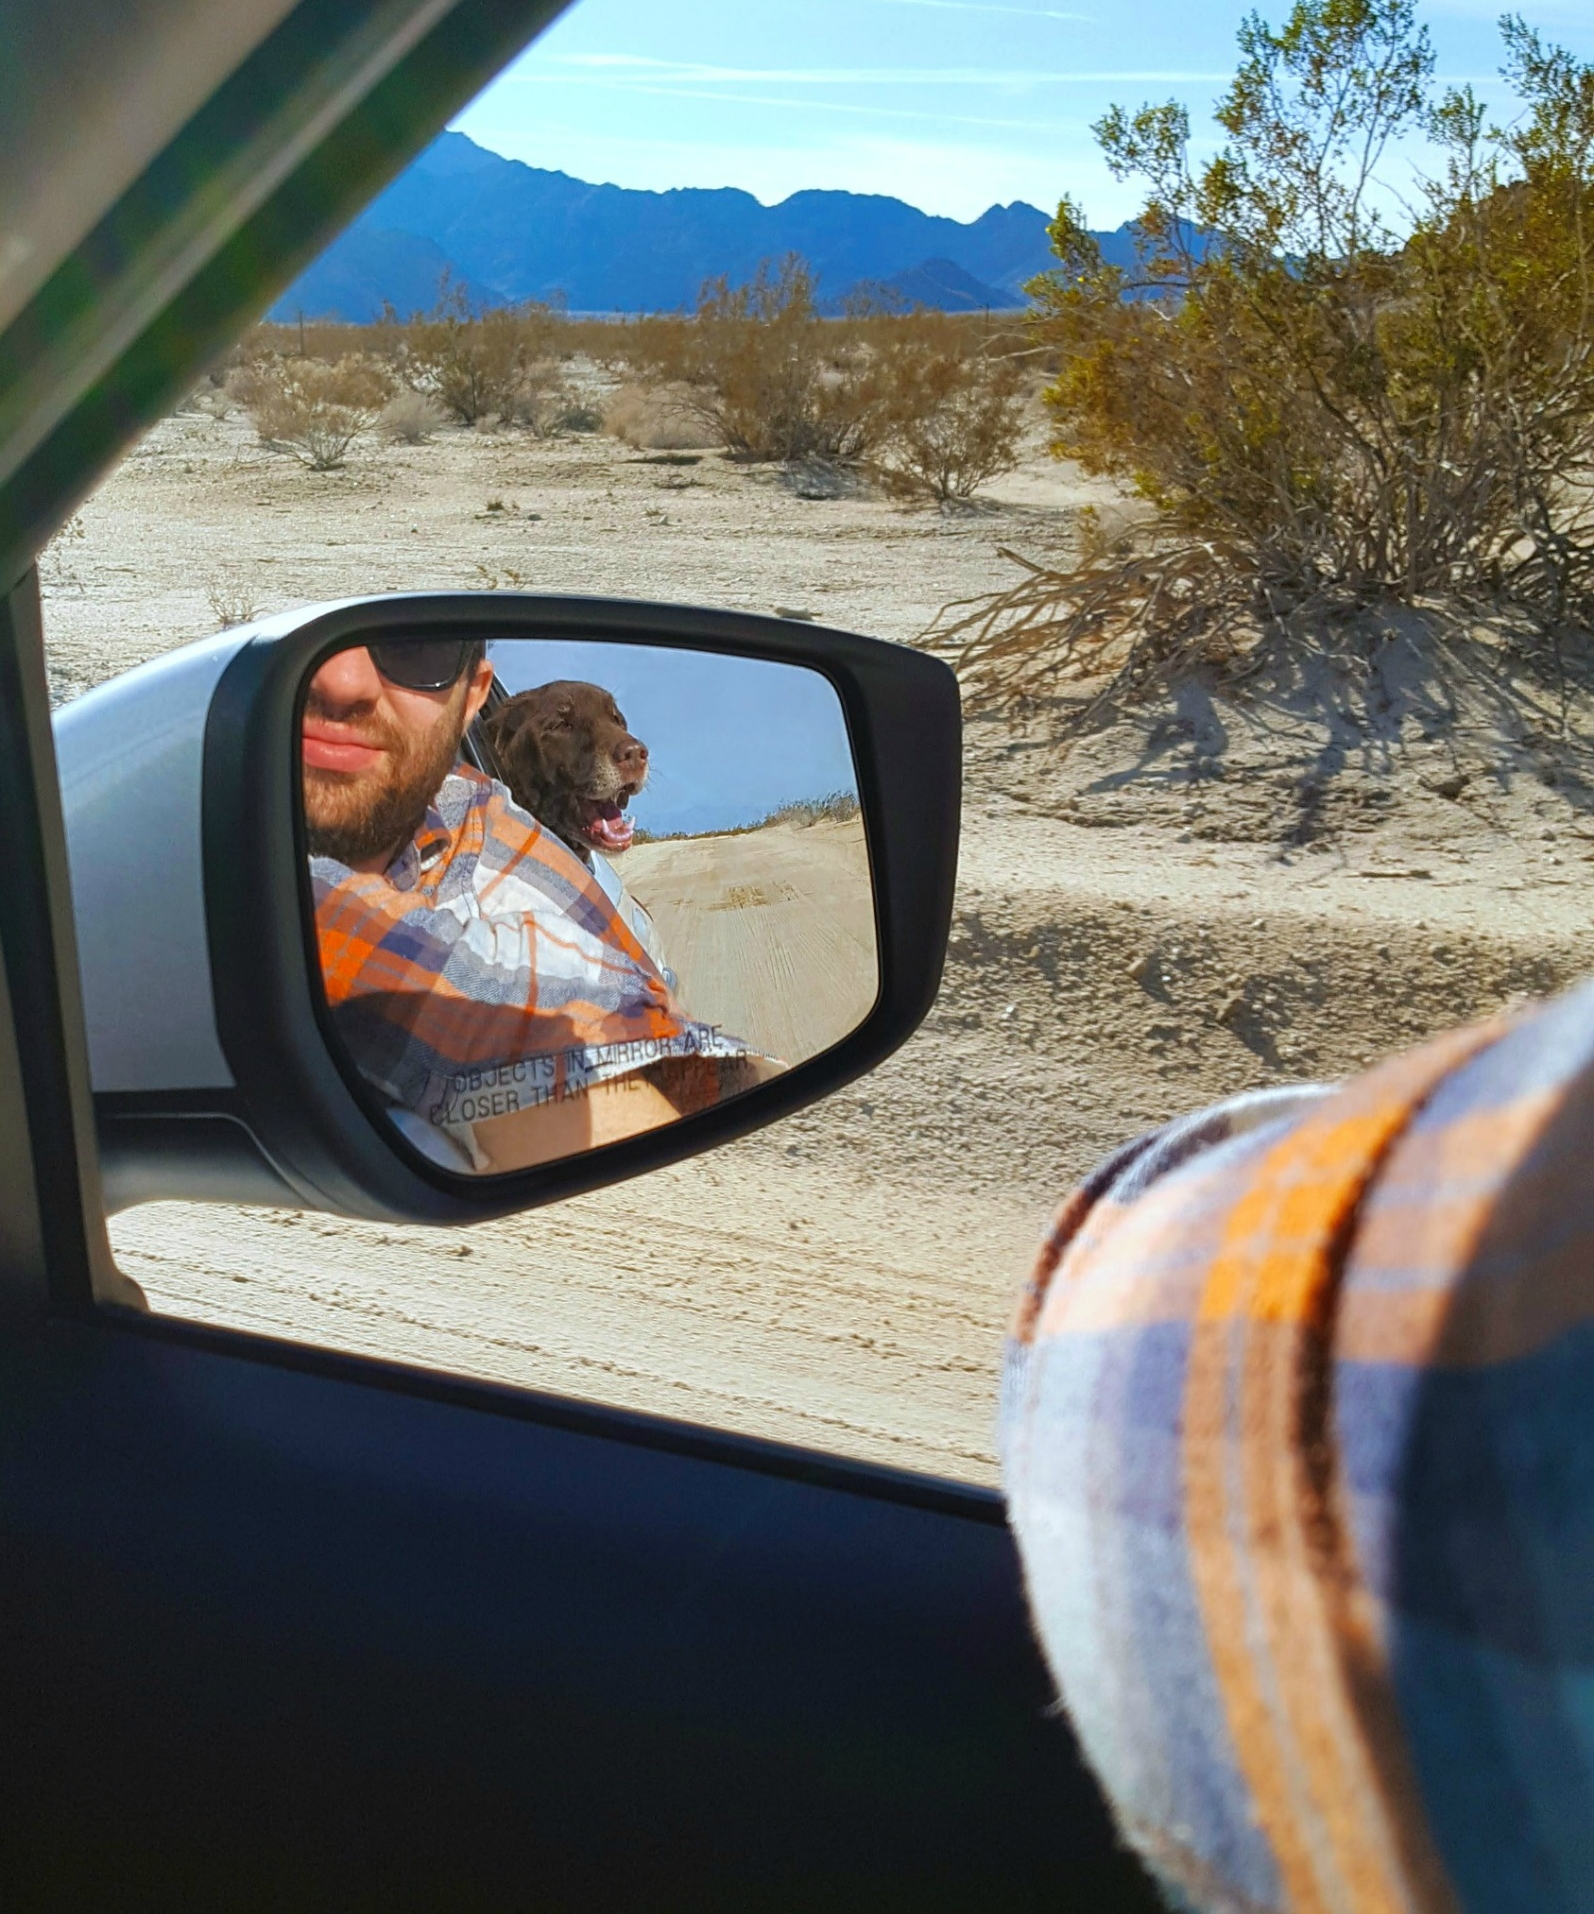 Bailey-Alec-Mojave-Desert 26Dec2016-resized.jpg